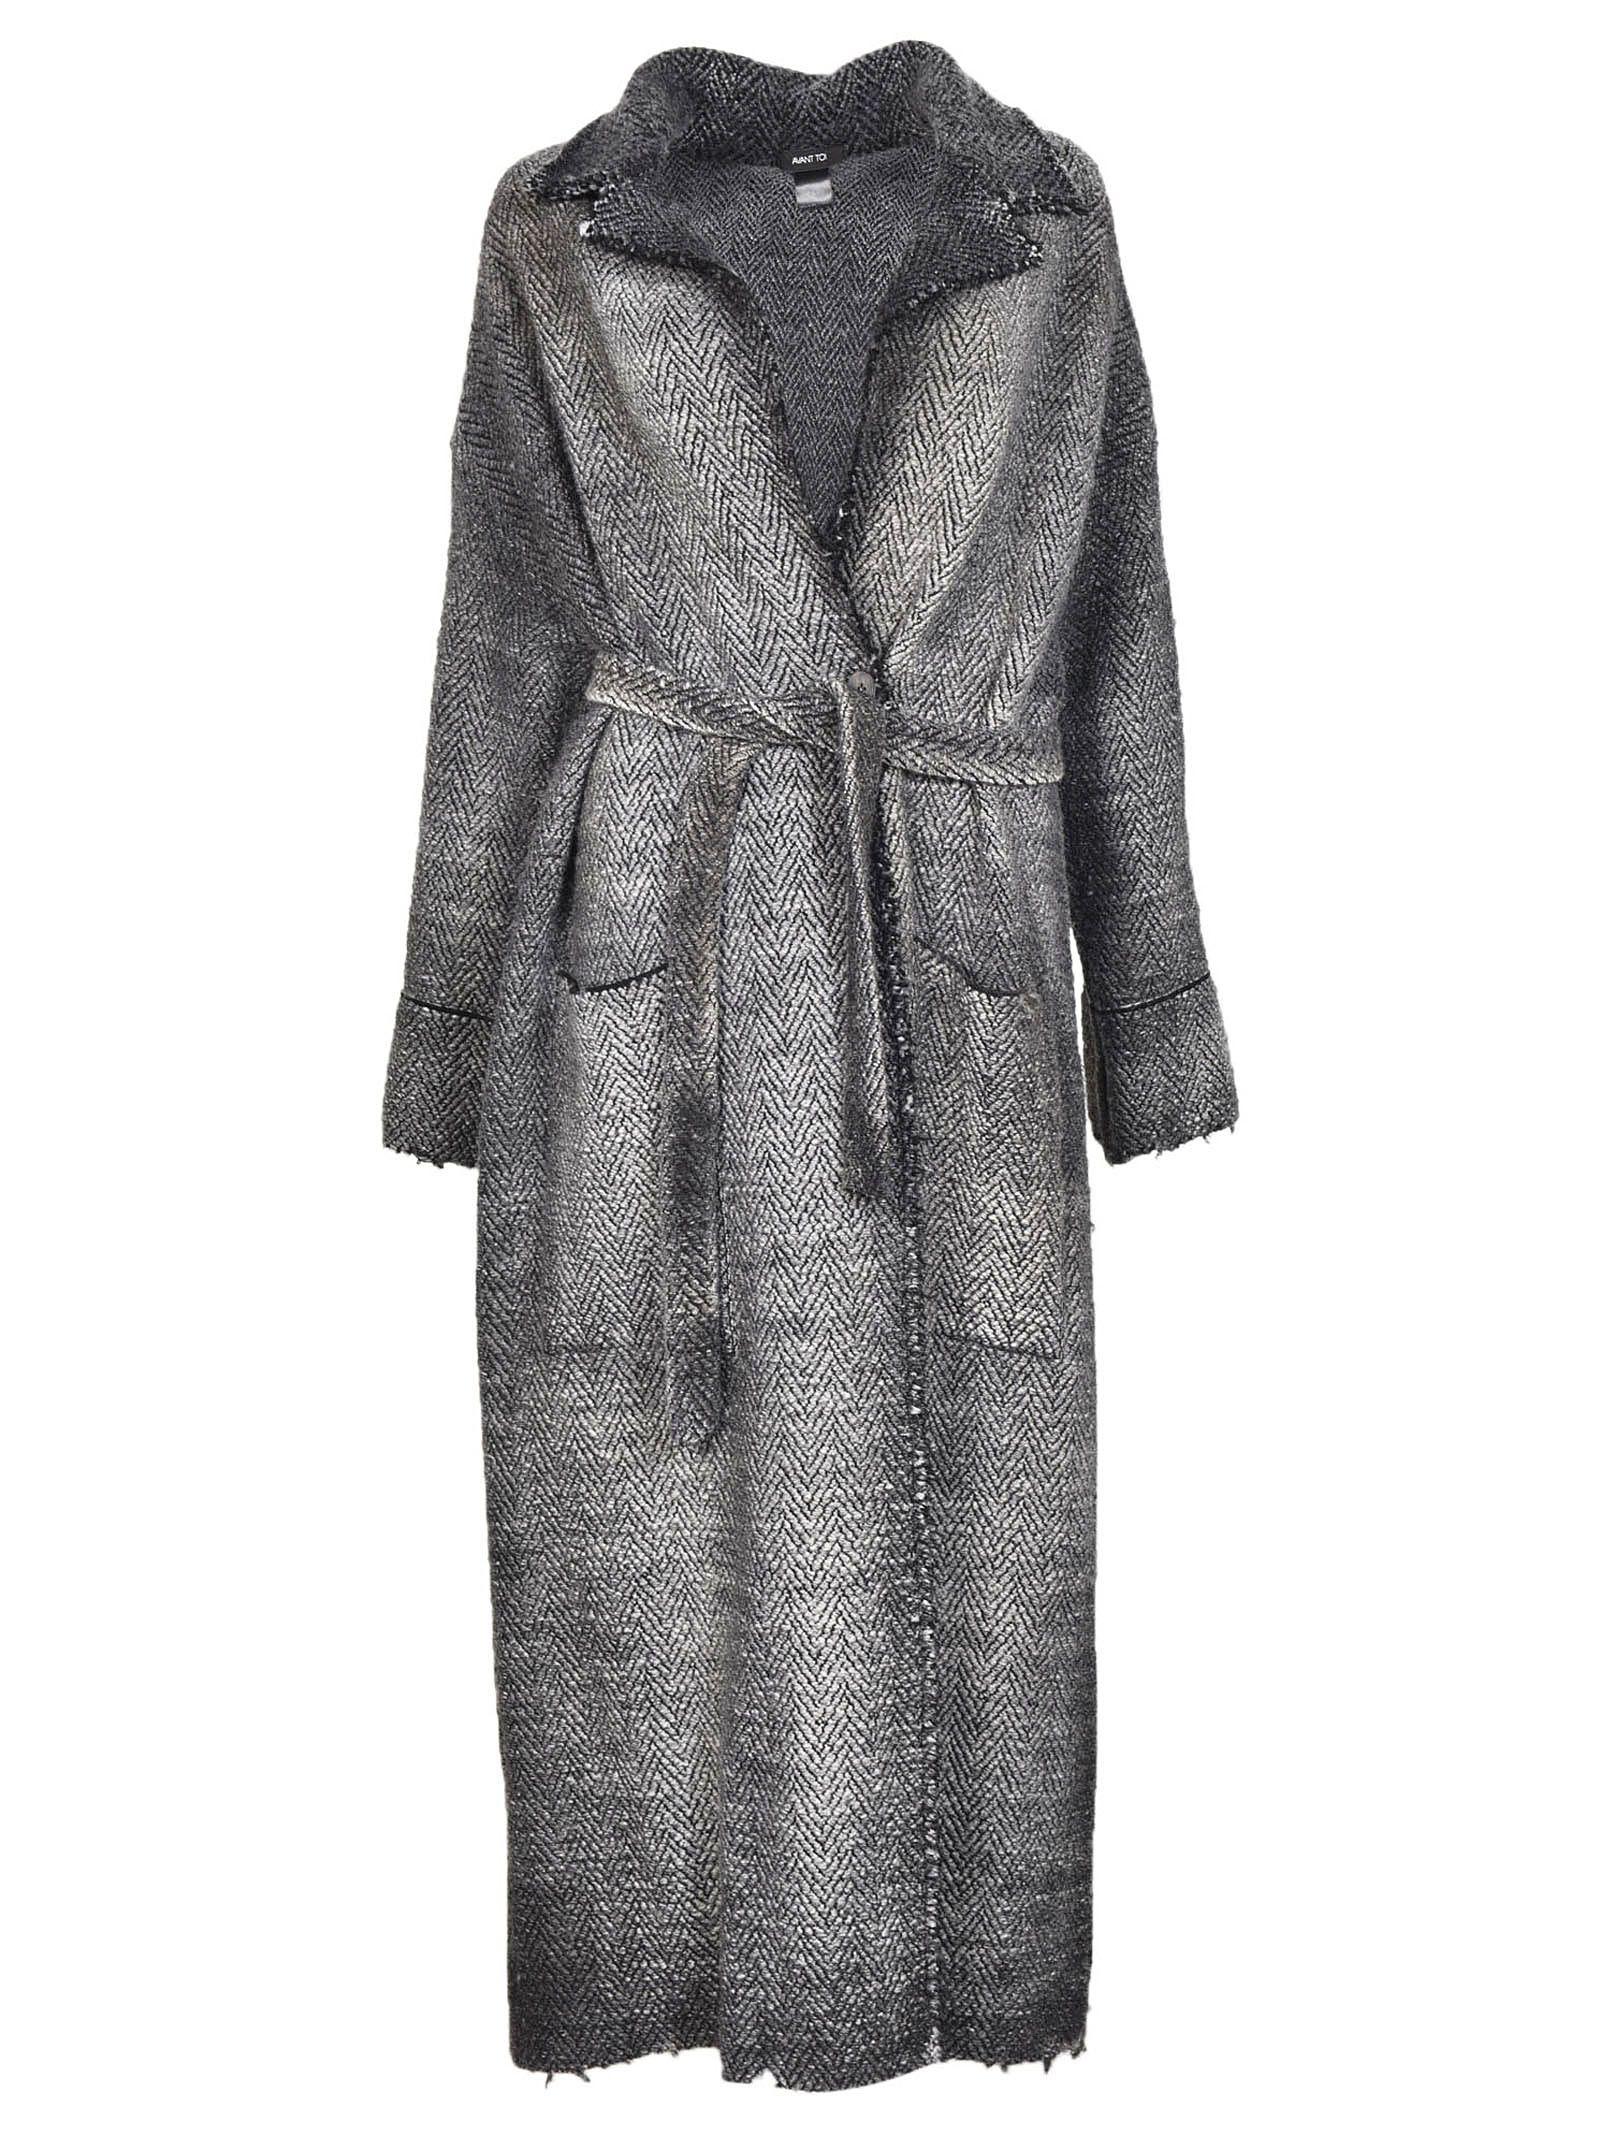 Avant Toi Belted Coat